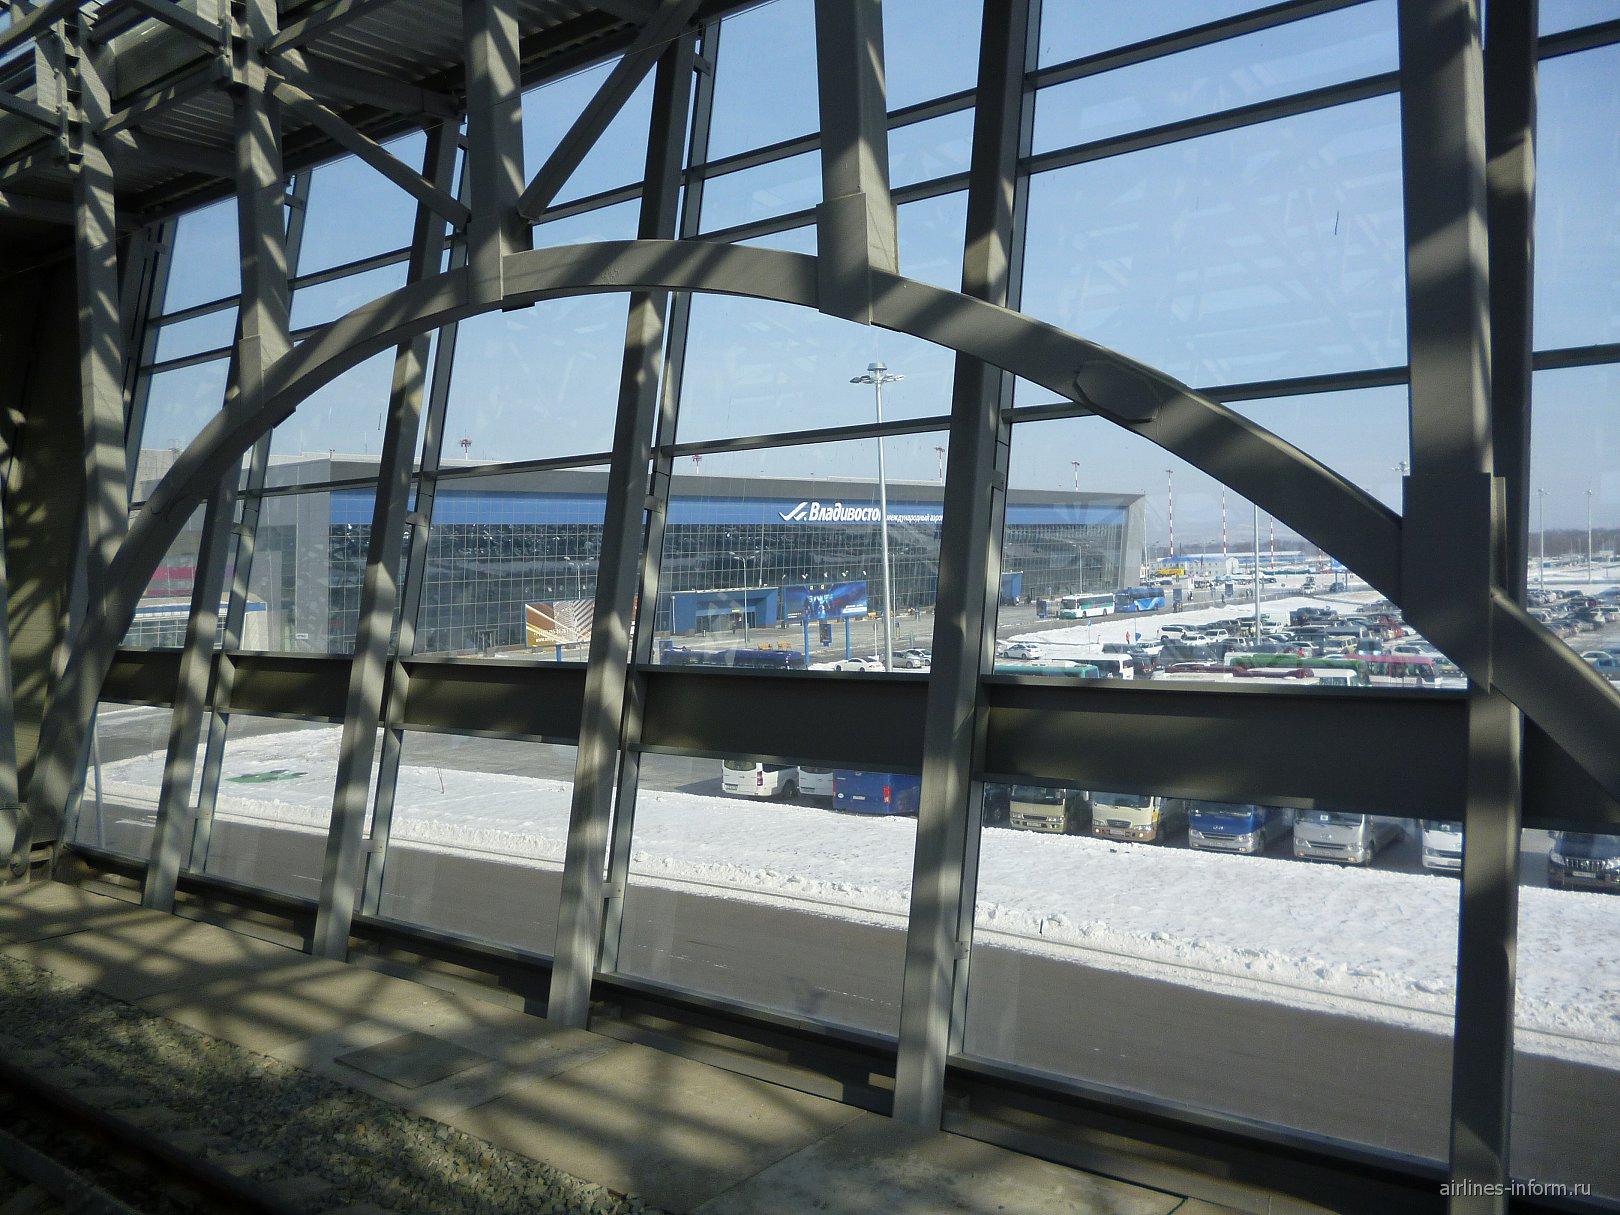 Терминал аэропорта Владивосток со станции Аэроэкспресса